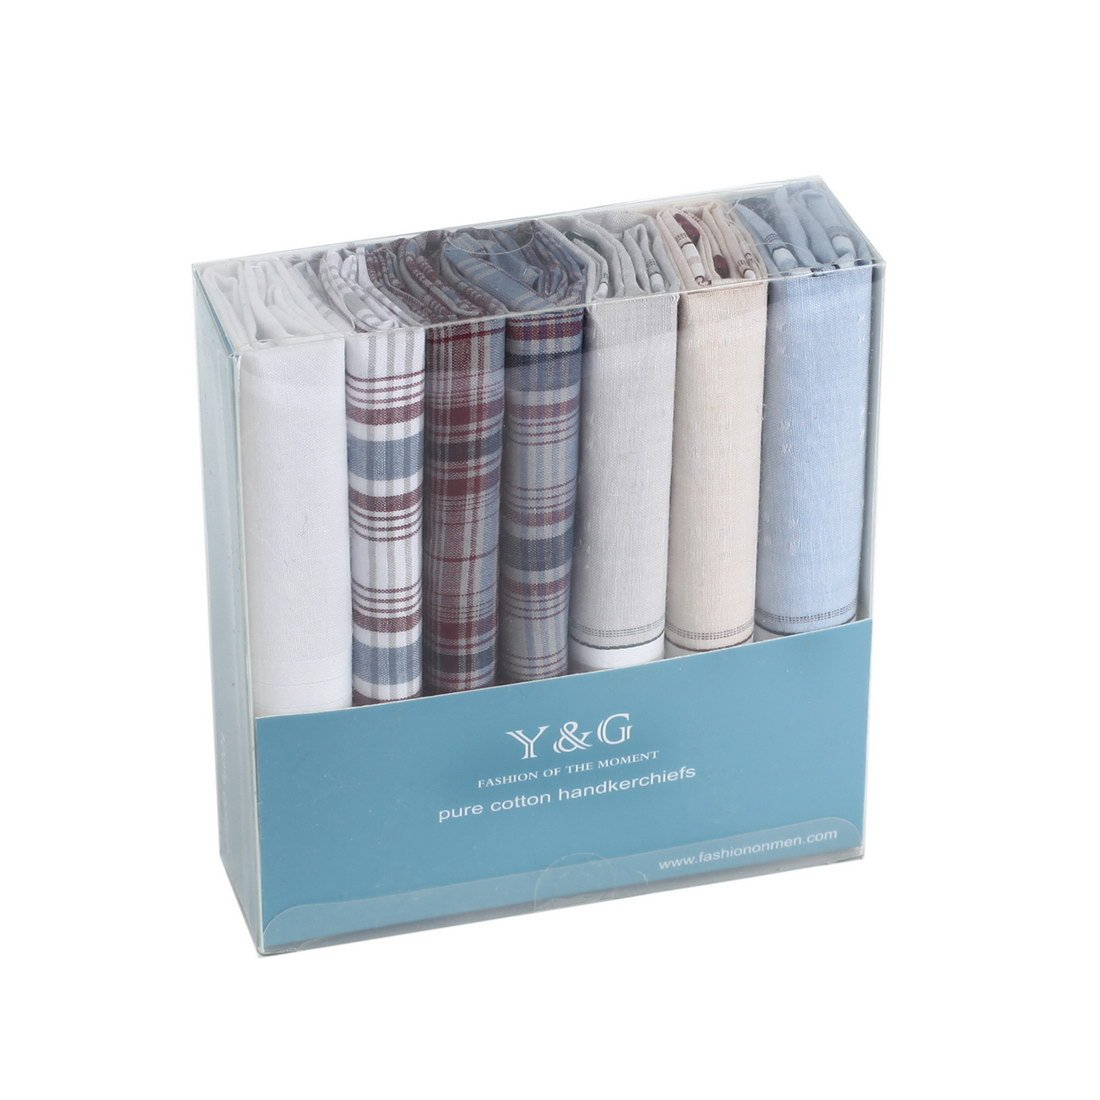 YEC0214 Grey Blue Plaid Absolutely Handkerchief Cotton Elegant Presents 7 Pack Handkercheifs Set By Y&G